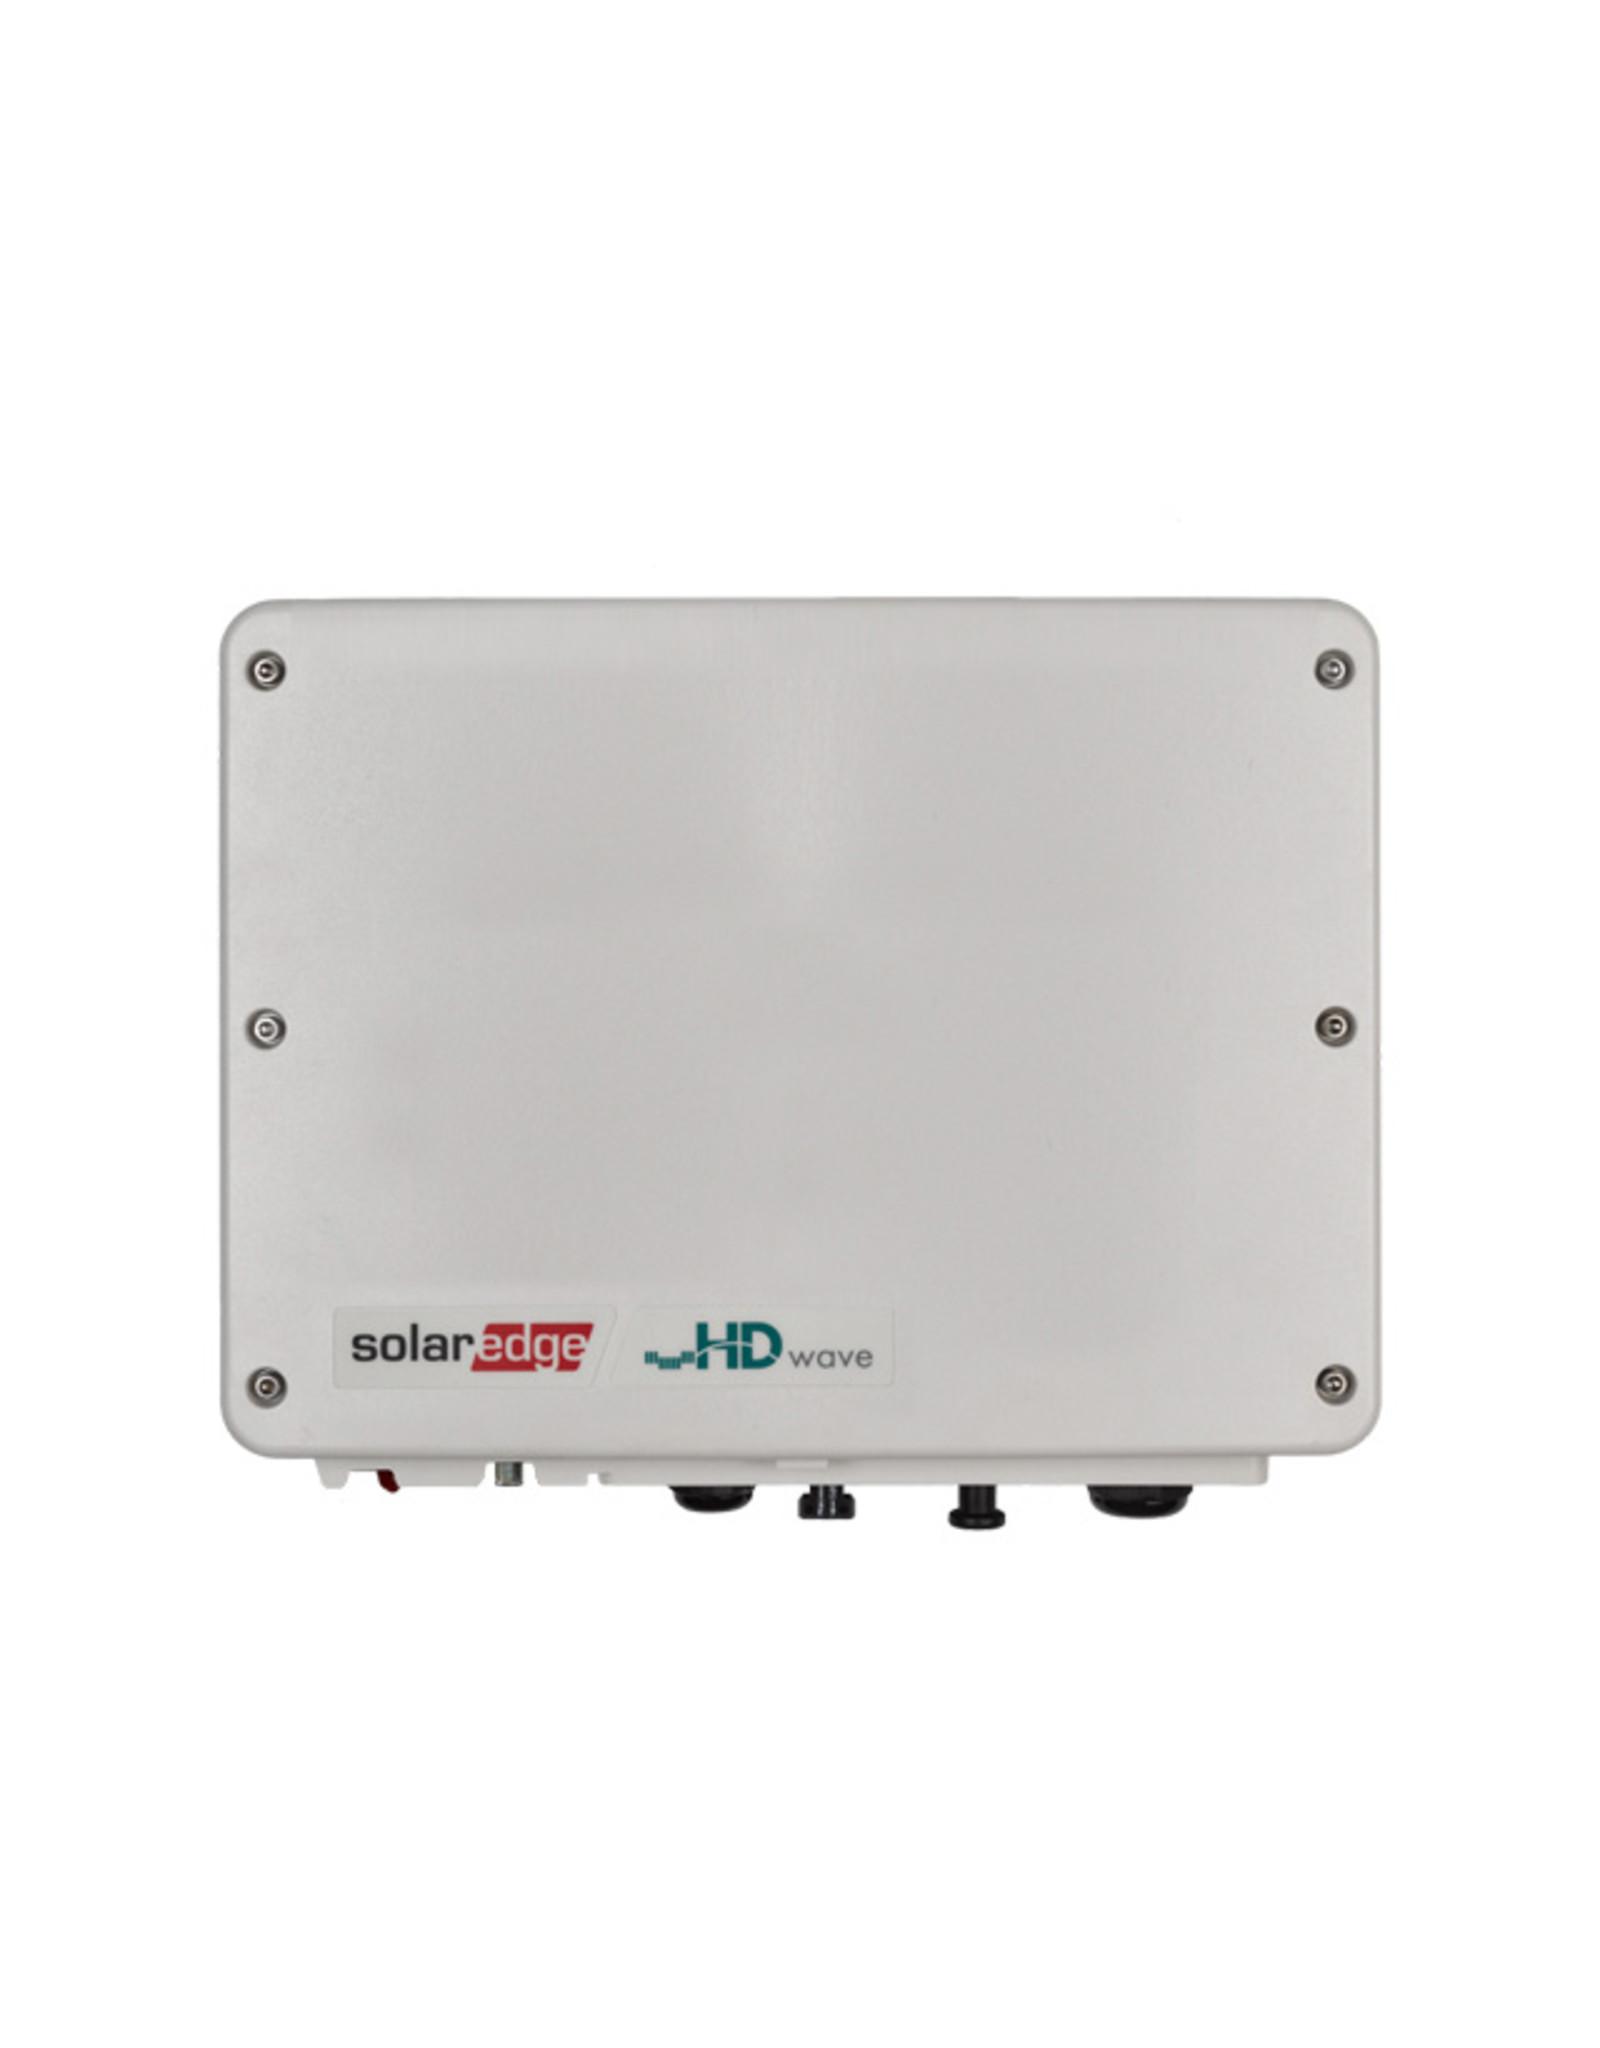 SolarEdge SolarEdge SE5000H enkelfase omvormer 5.0 kW HD-Wave - met SetApp configuratie